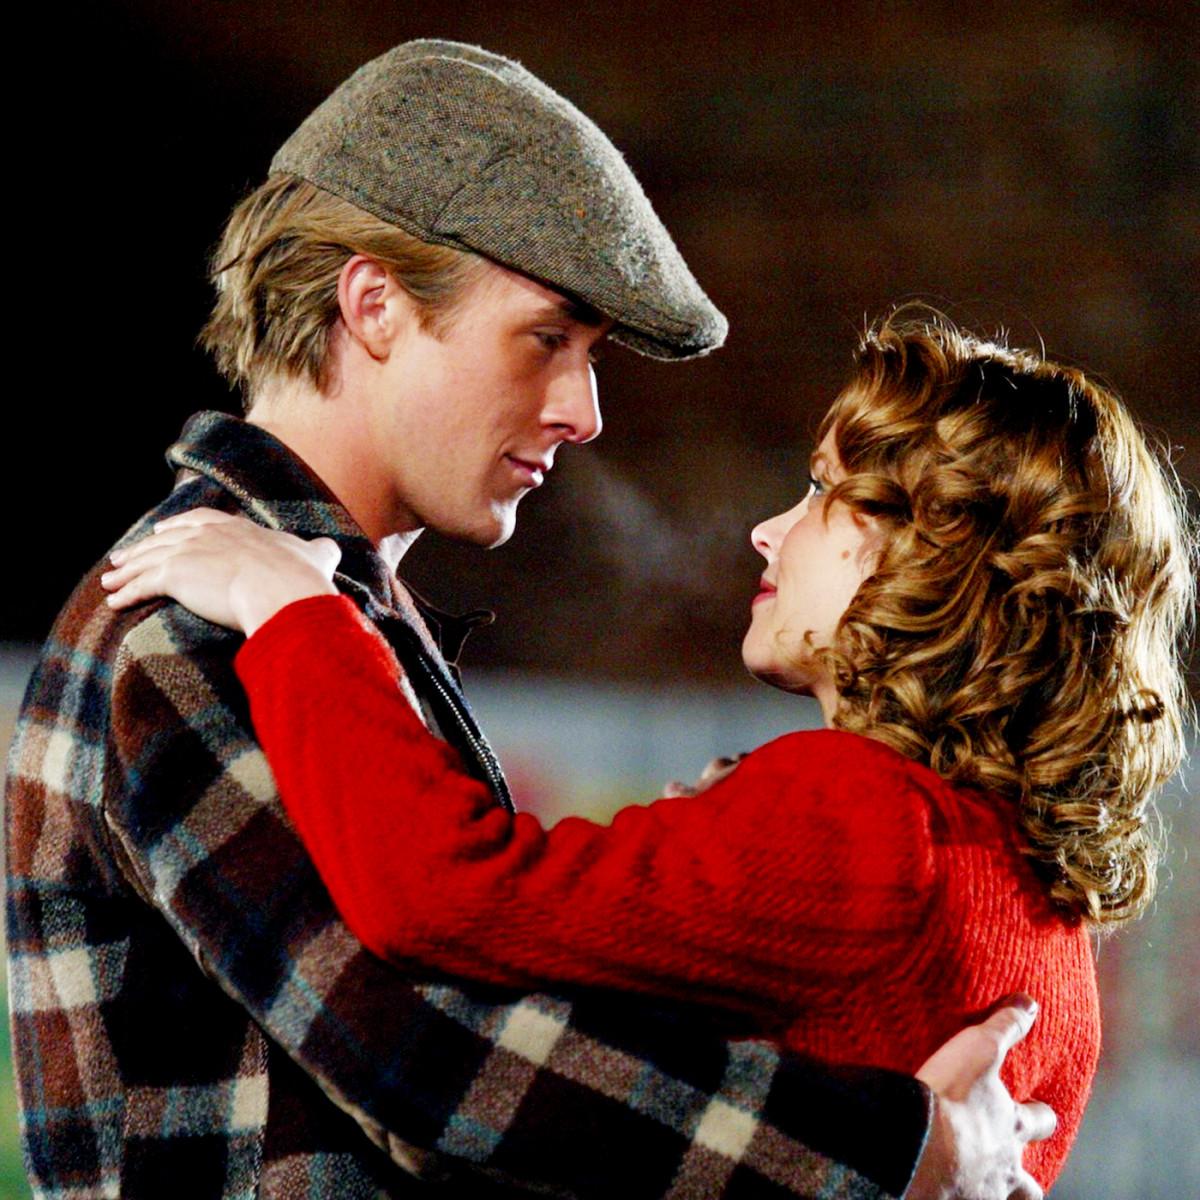 Ryan Gosling & Rachel McAdams.